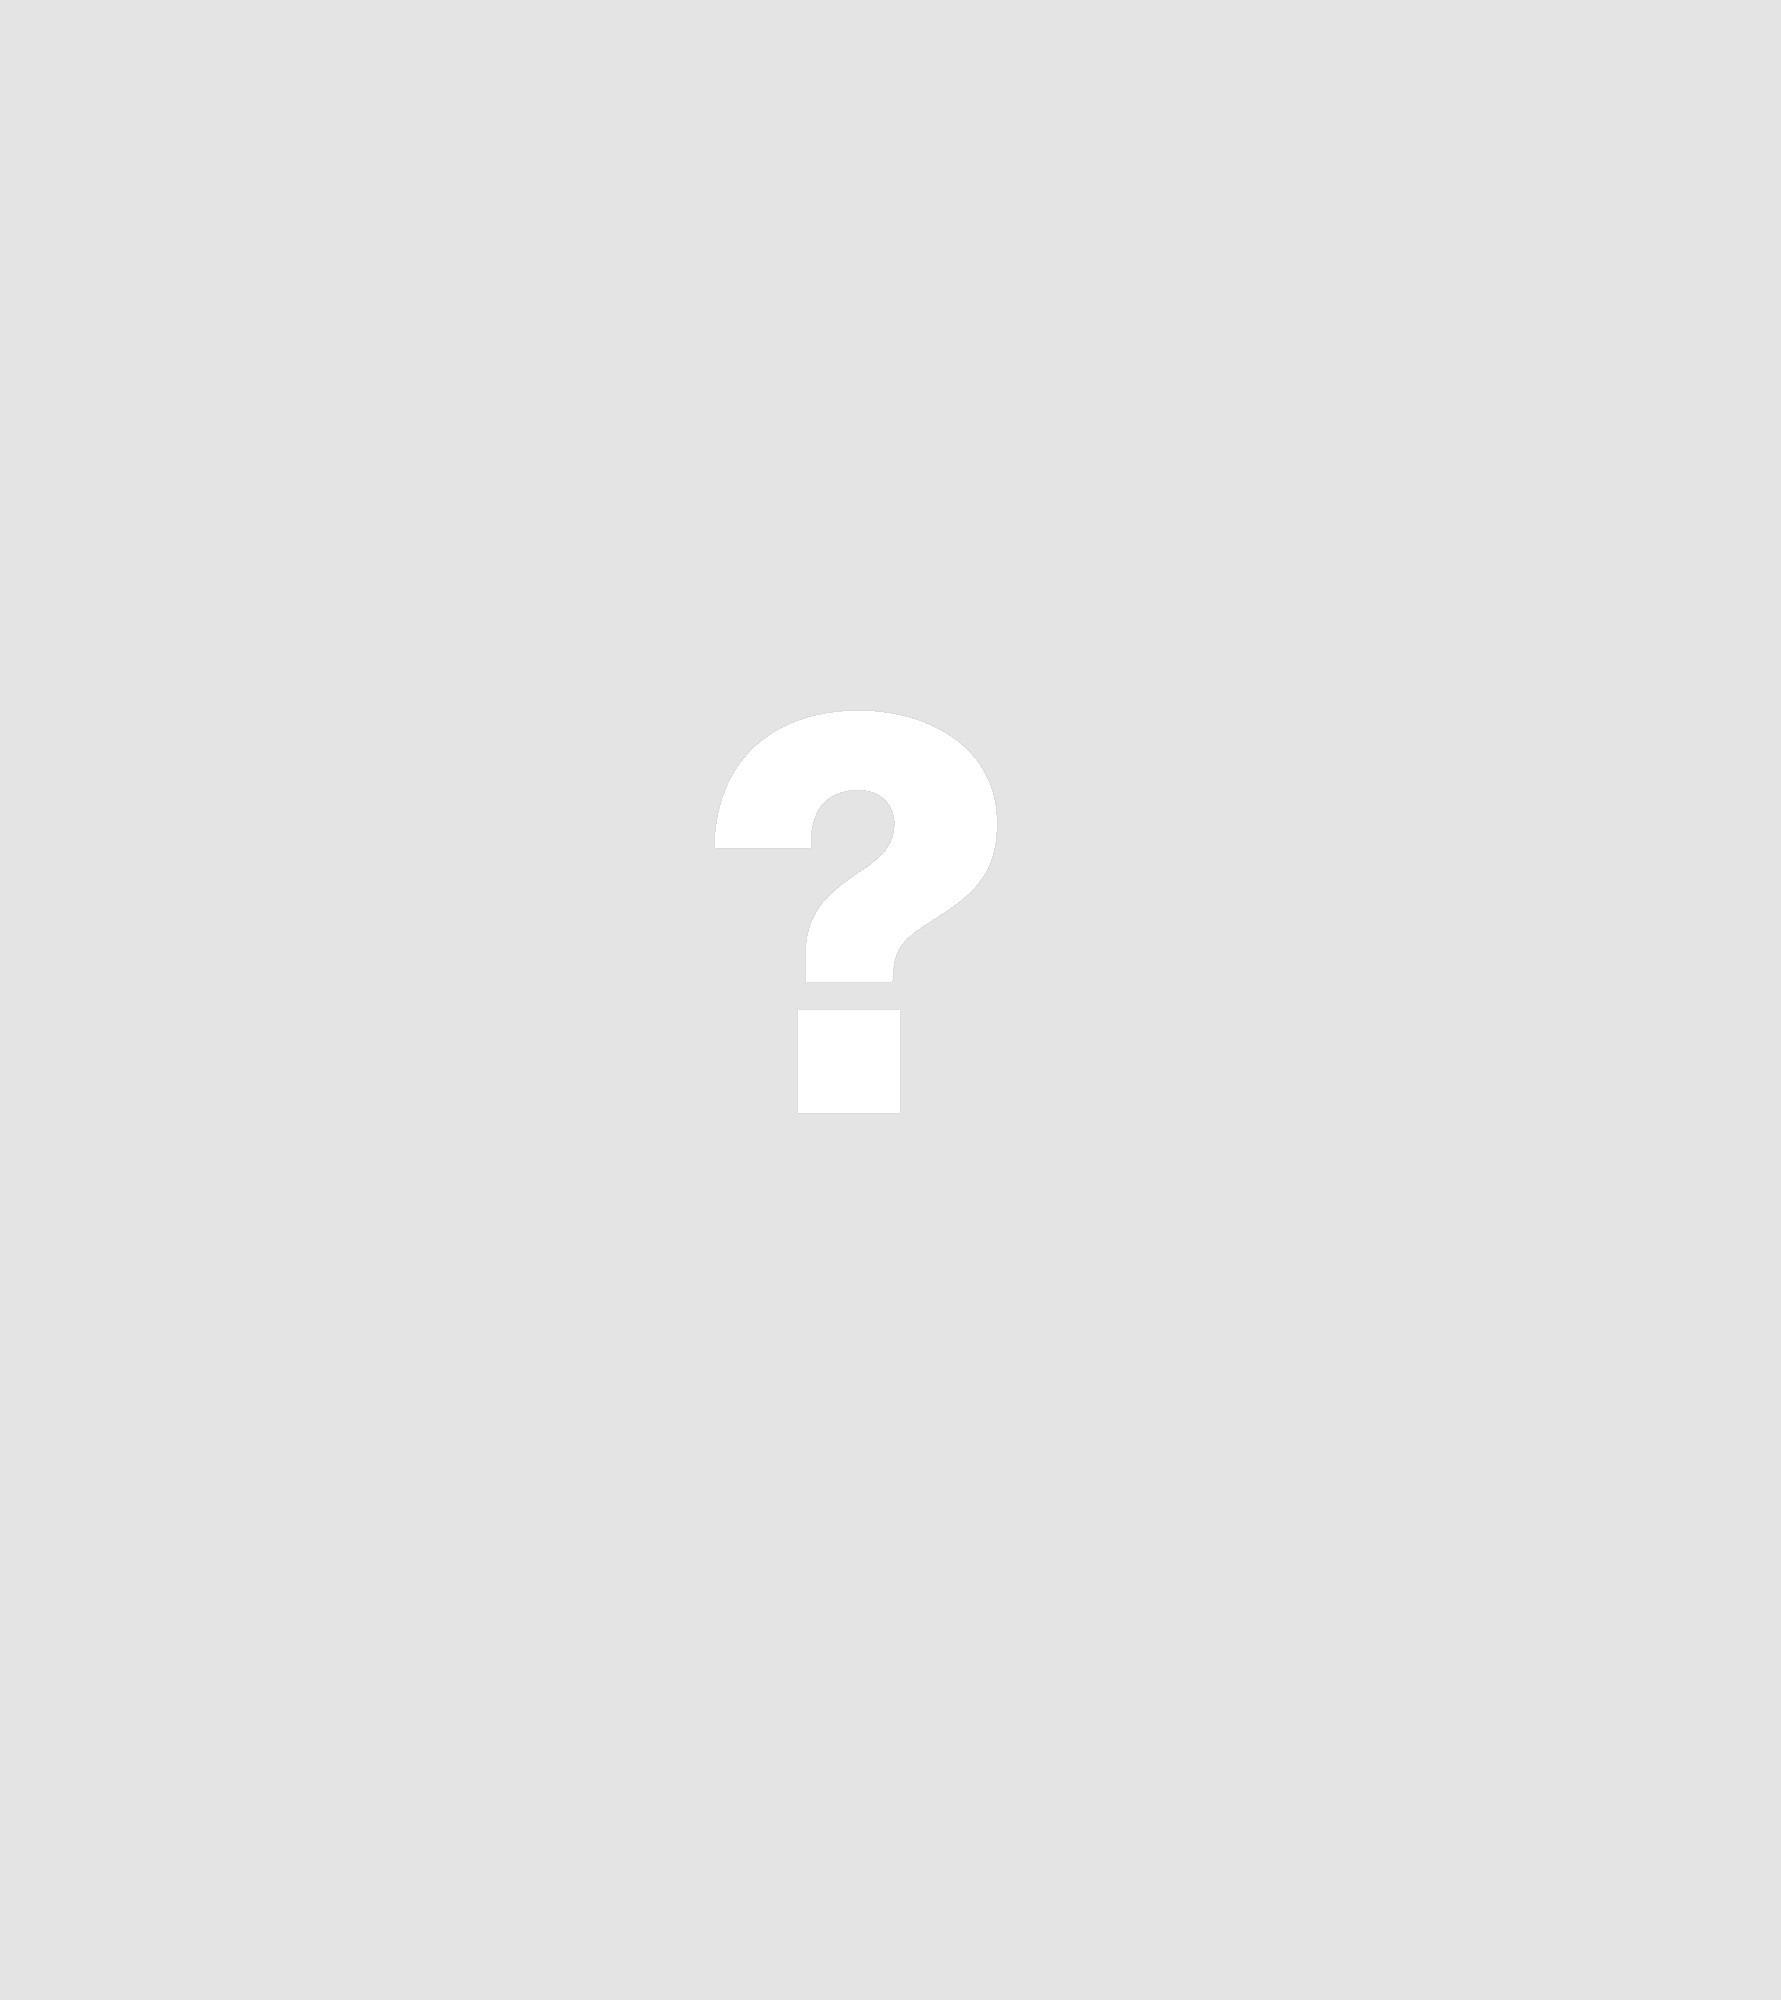 Vivienne Westwood Orb Shirt